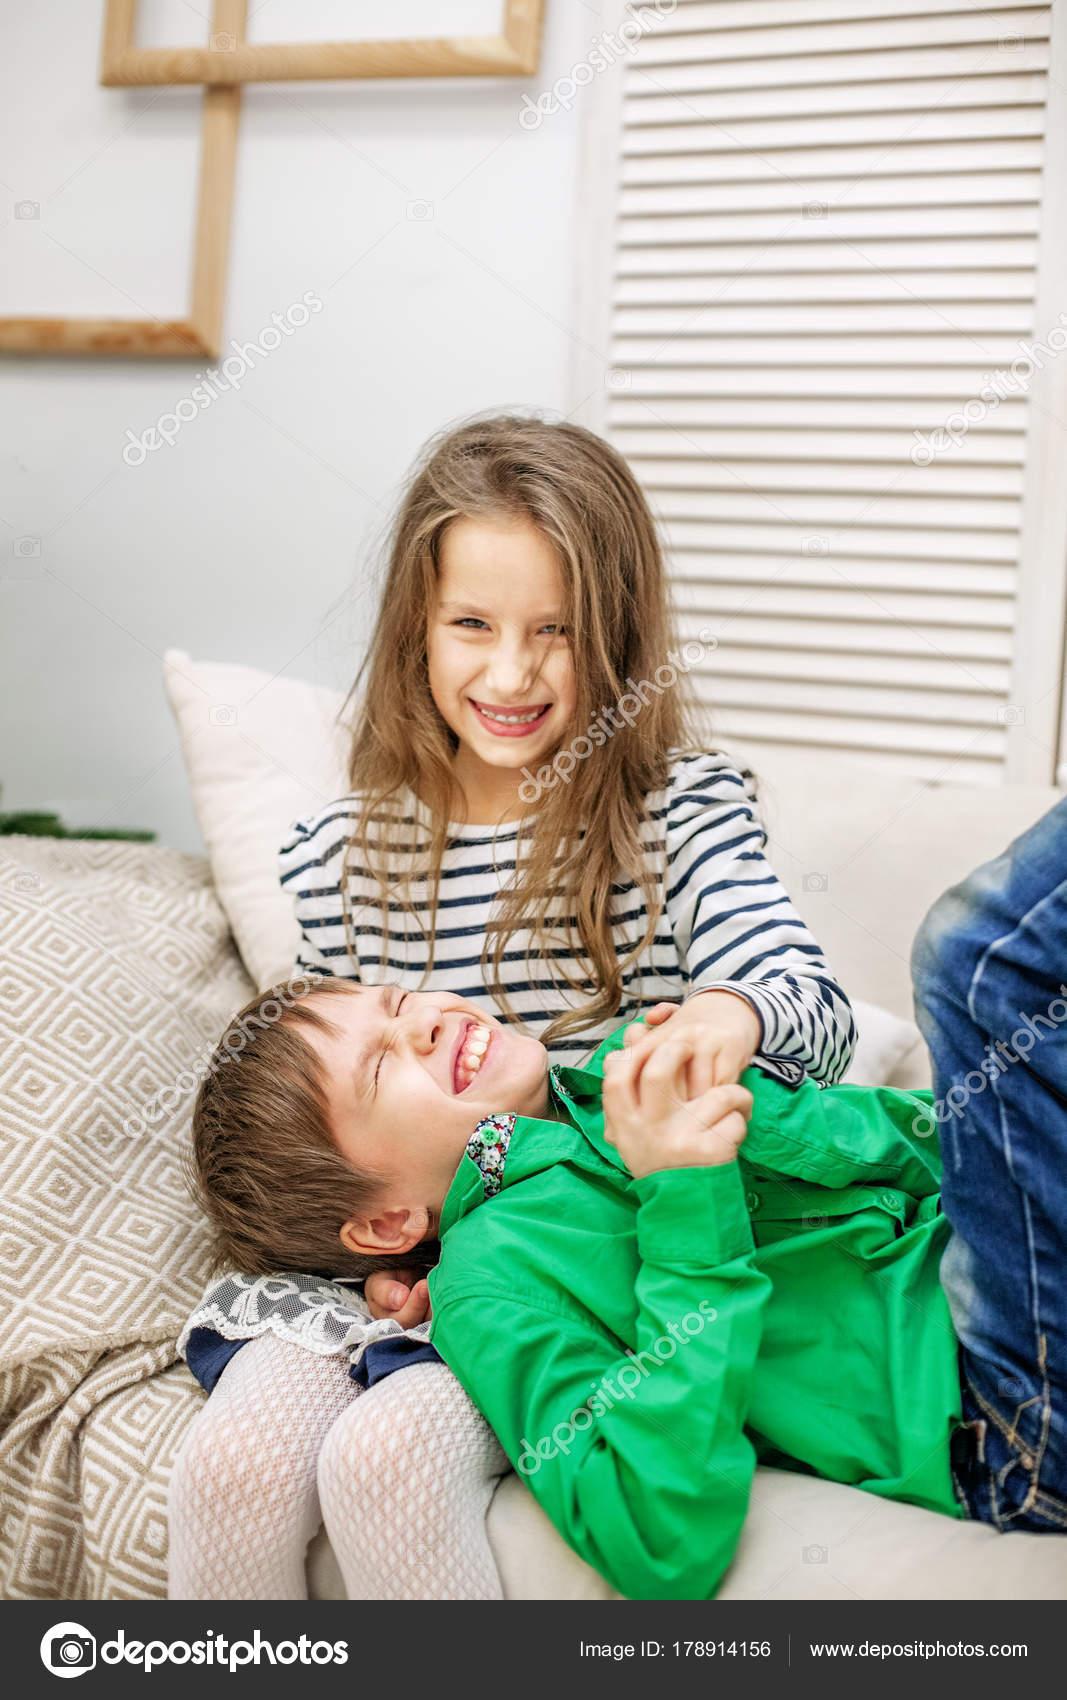 372ec918307 Δύο παιδιά καλπάζει στον καναπέ. Το αγόρι και το κορίτσι ...